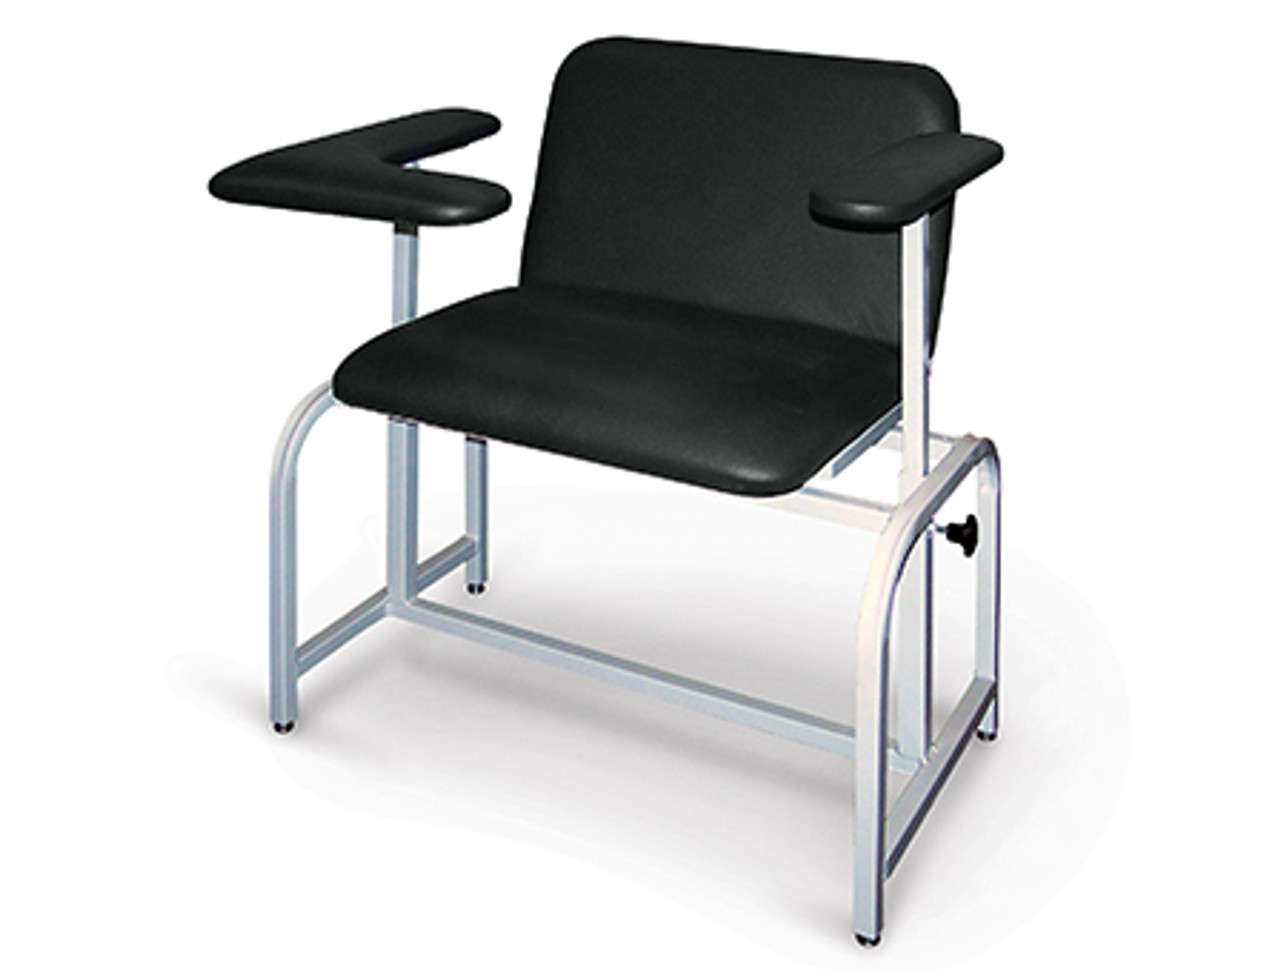 Astounding Hausmann 2198 Bariatric Blood Phlebotomy Chair Theyellowbook Wood Chair Design Ideas Theyellowbookinfo